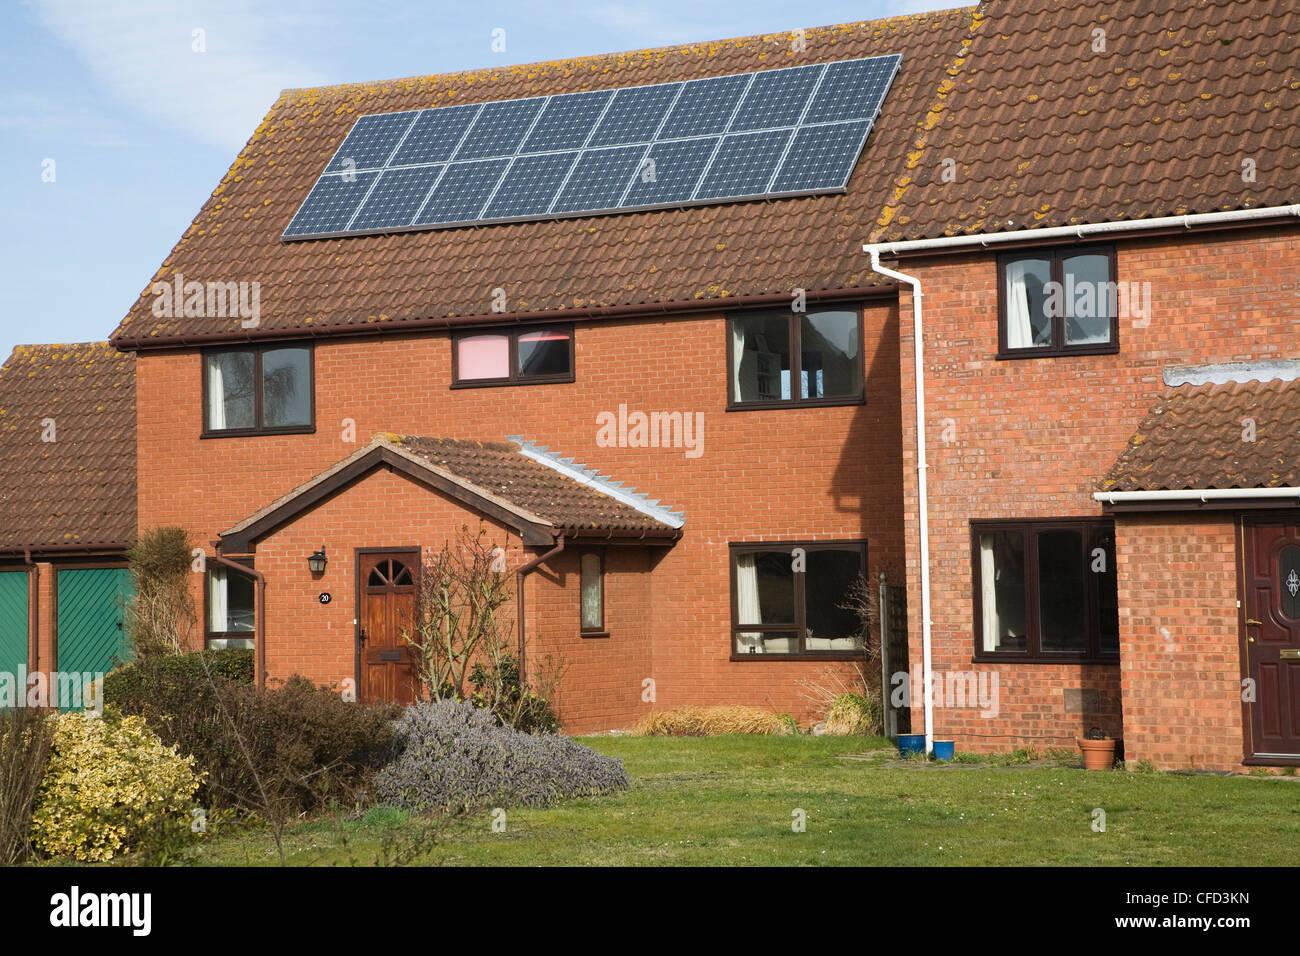 Solar panels of roof domestic property, Martlesham, Suffolk, England - Stock Image